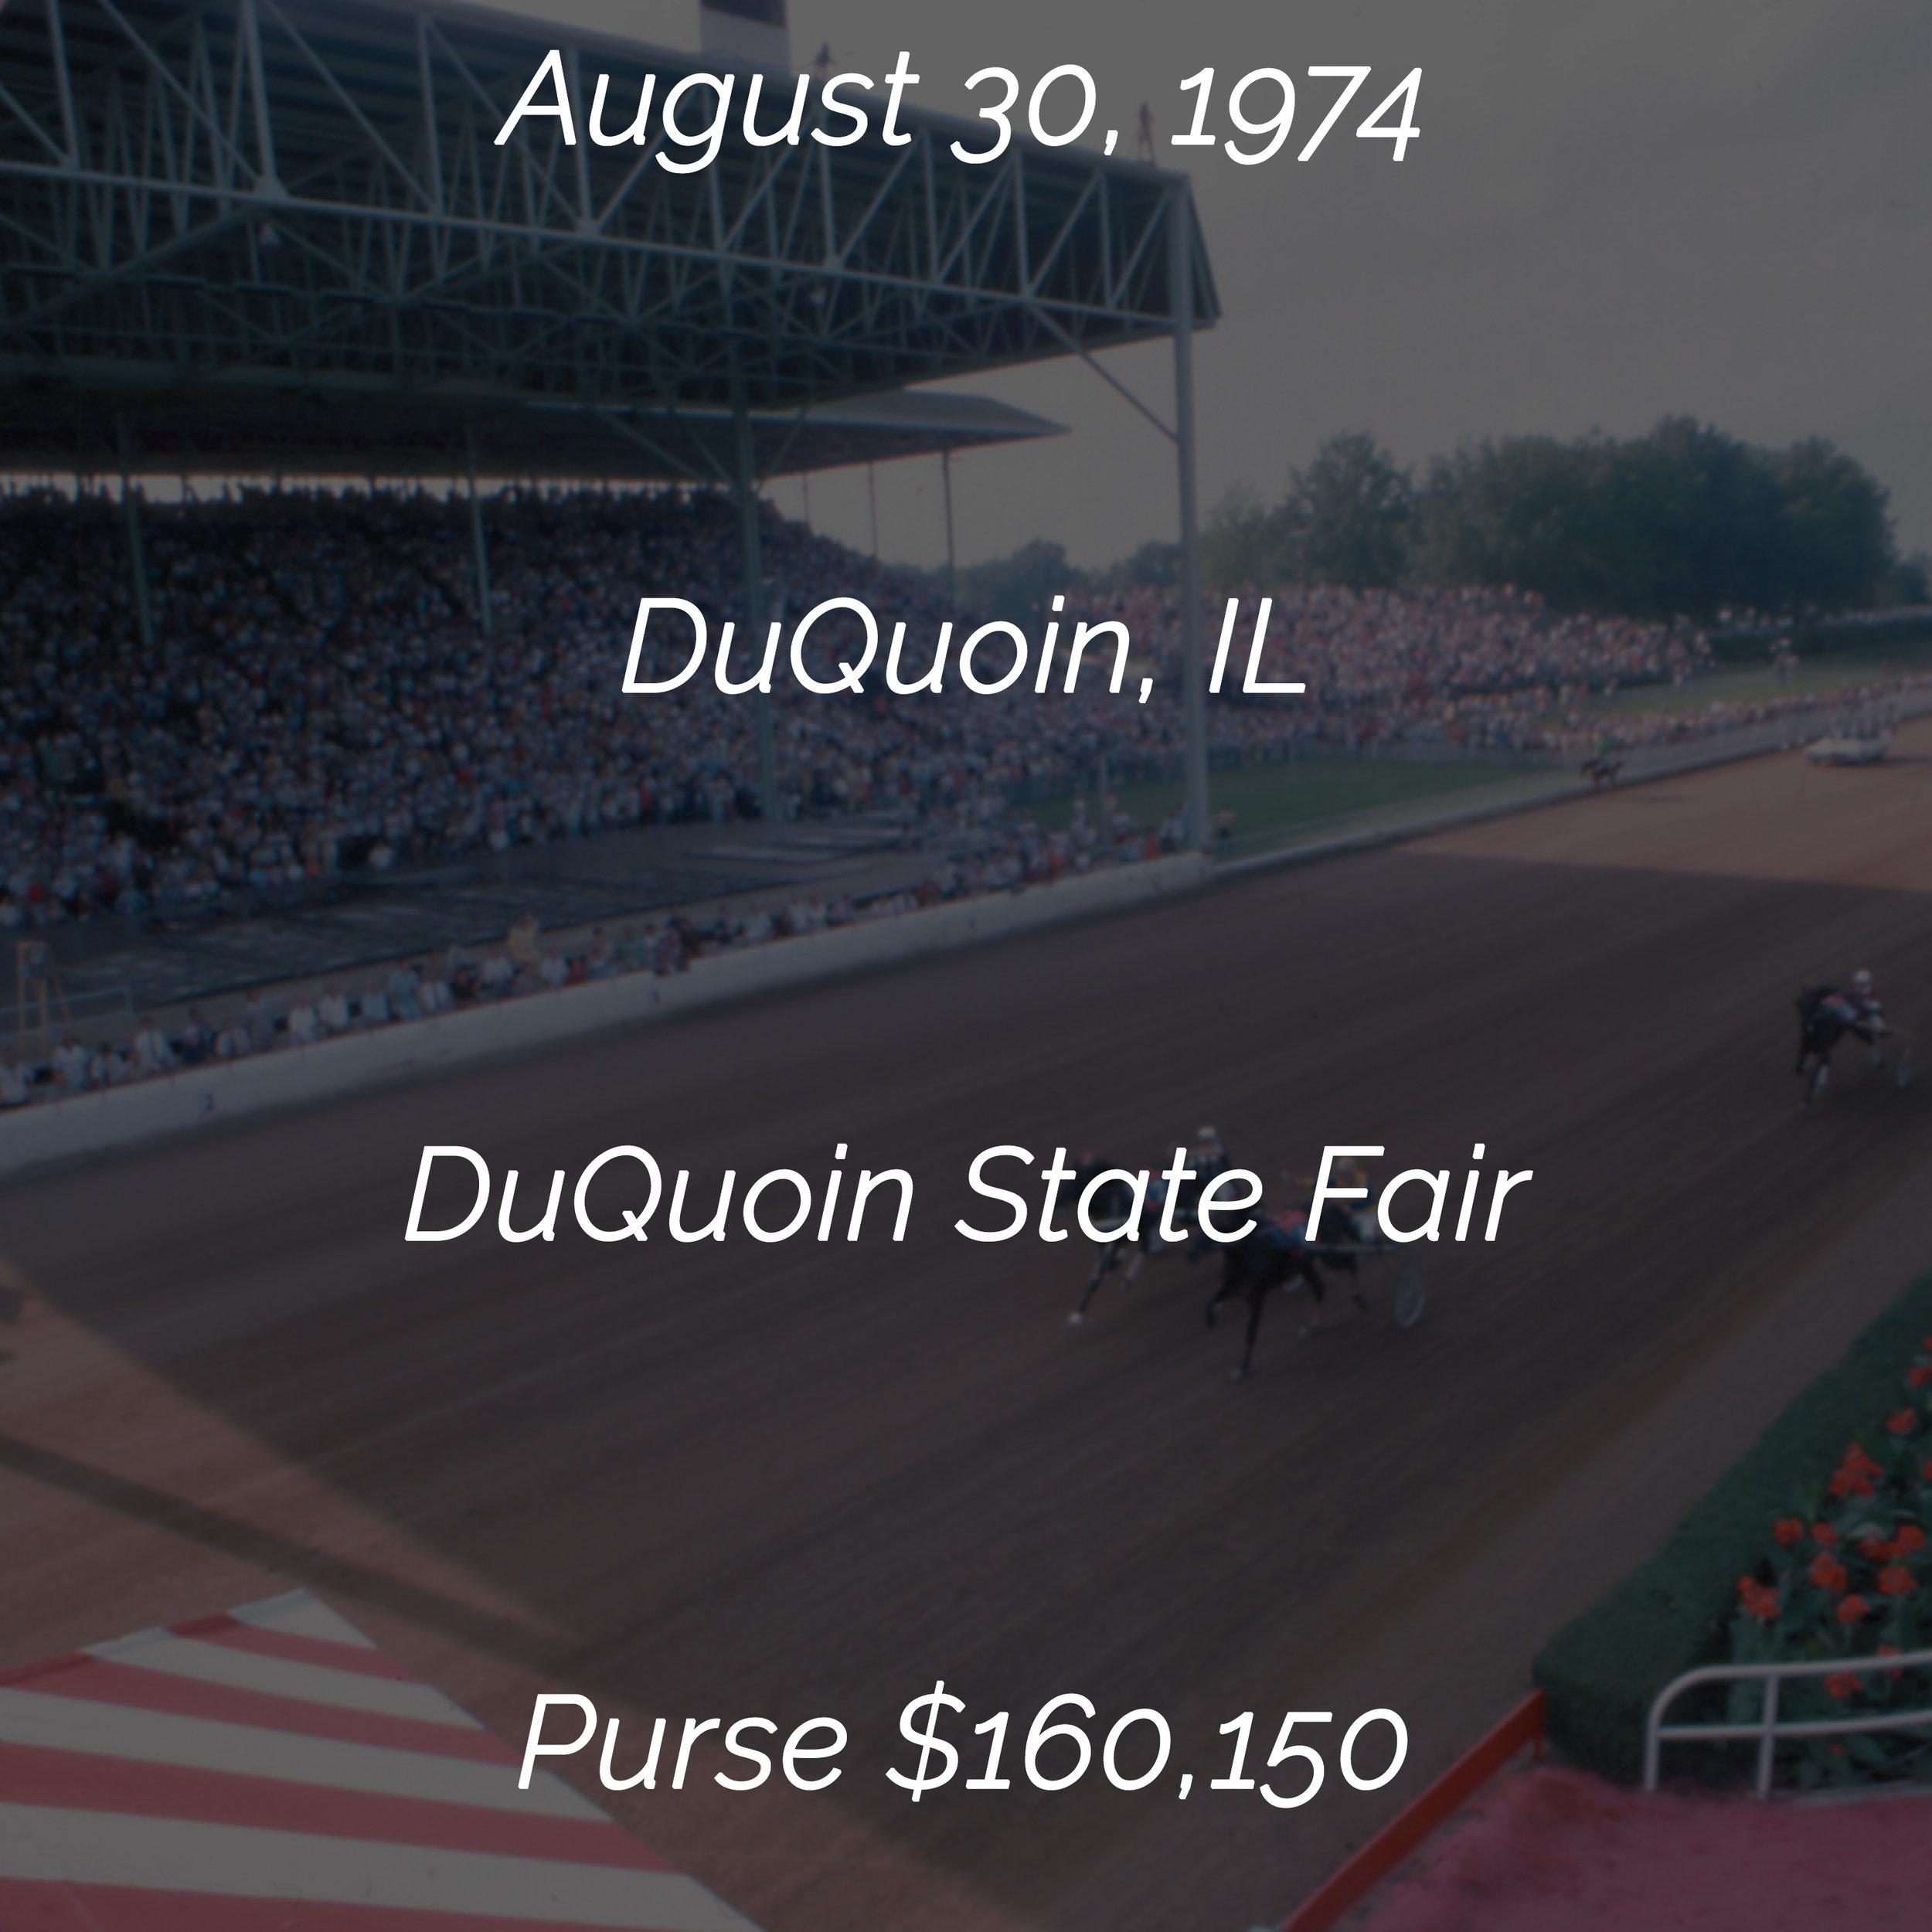 1974 history info square.jpg